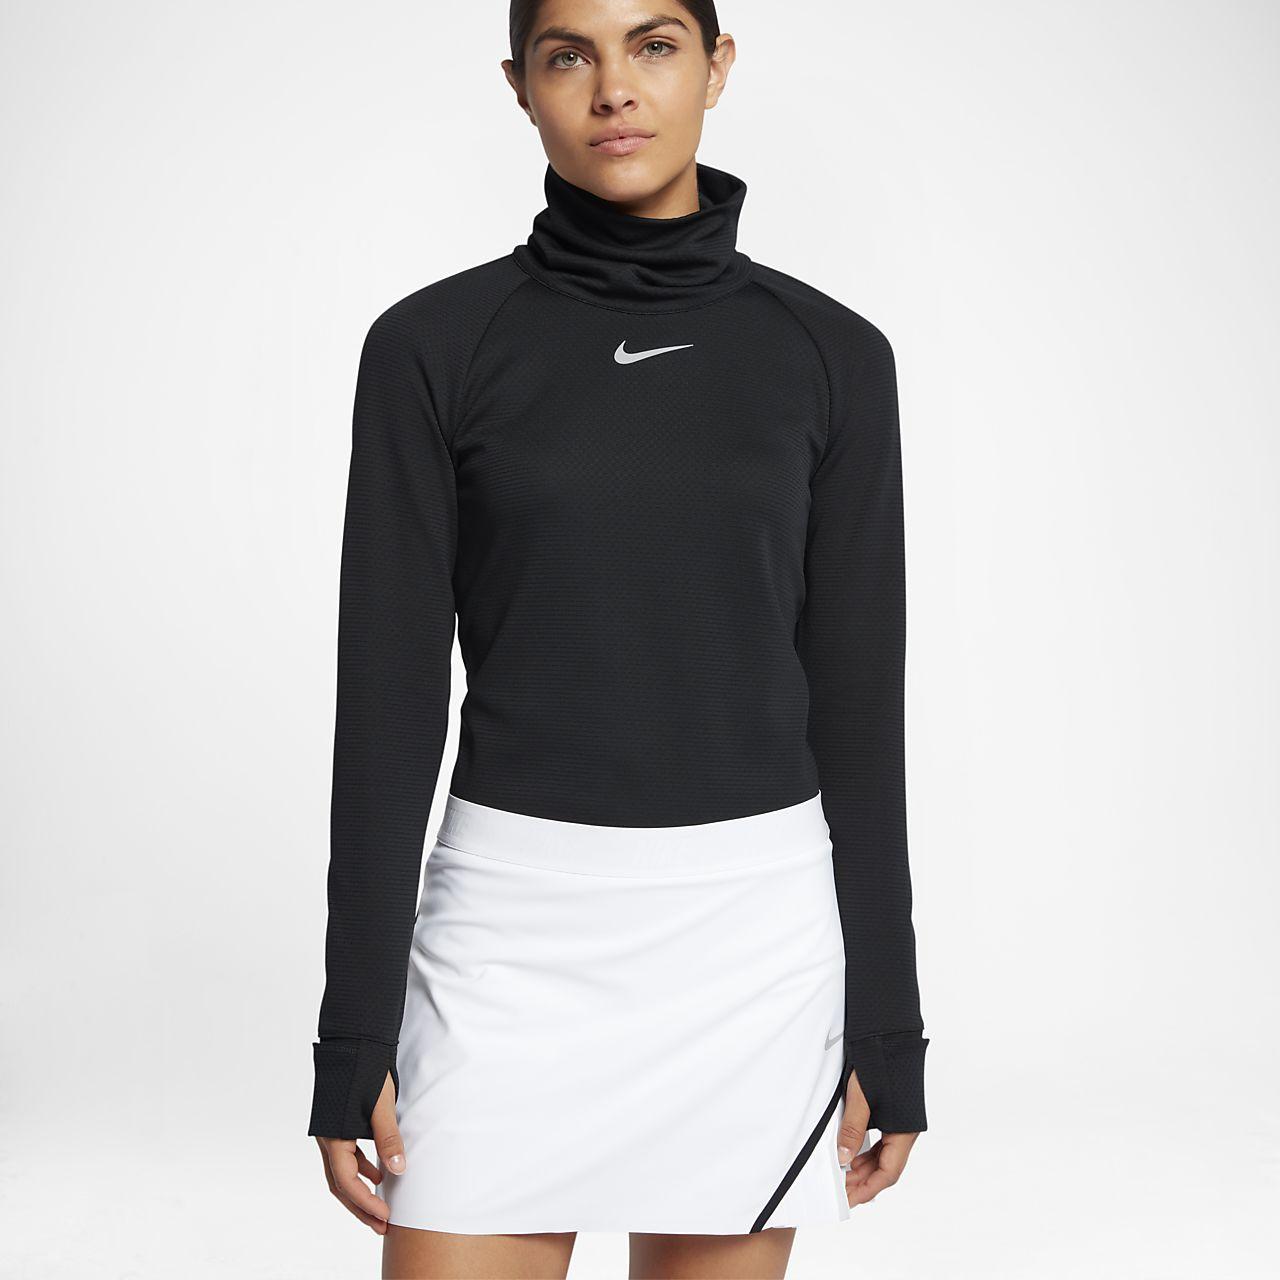 Damska koszulka do golfa z długim rękawem Nike AeroReact Warm